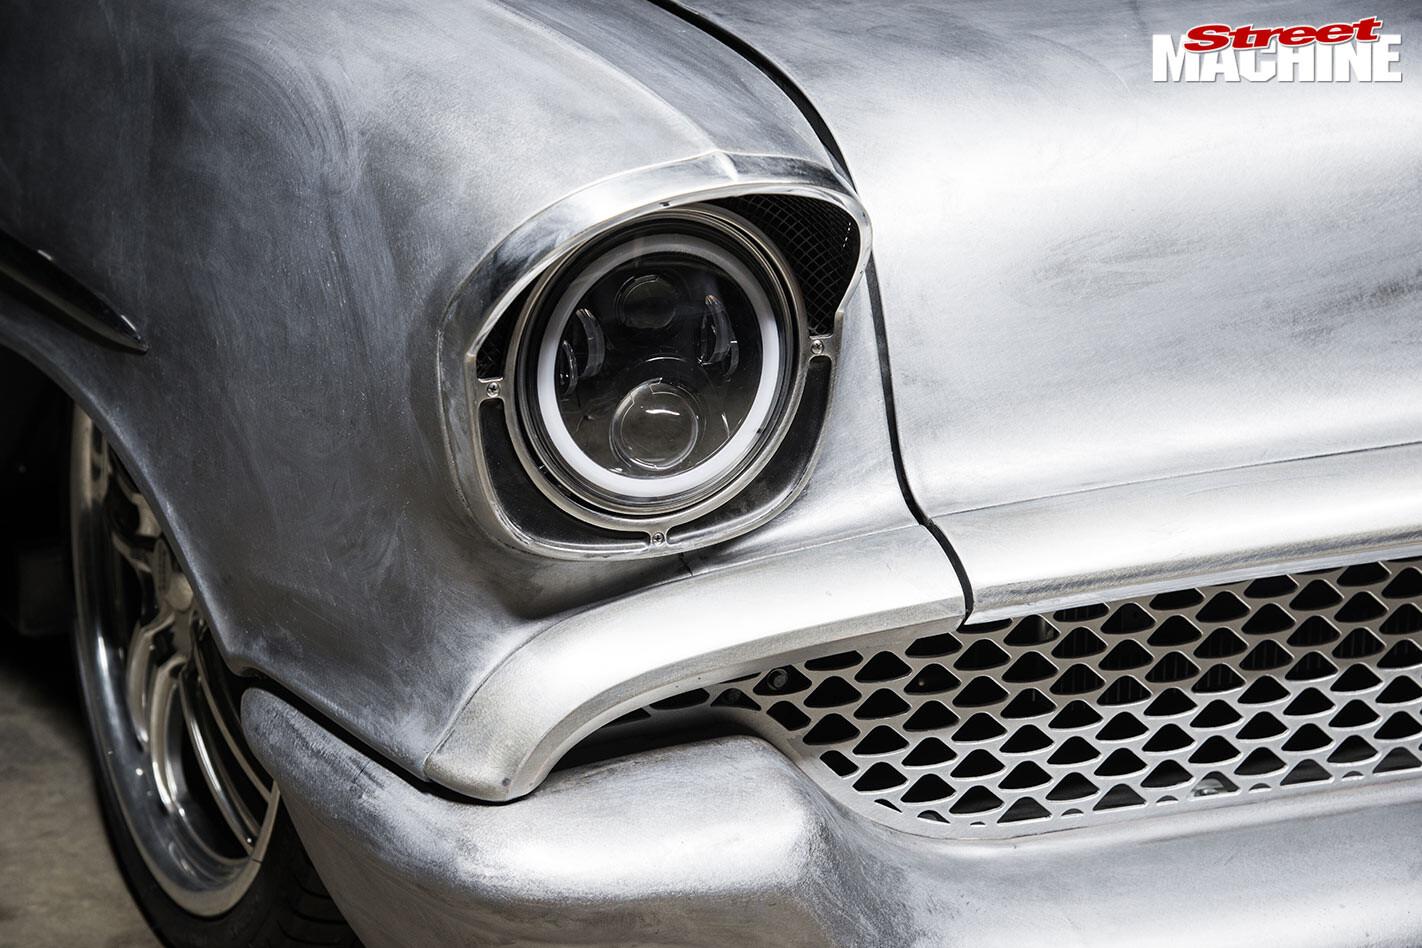 Chev Bel Air headlight